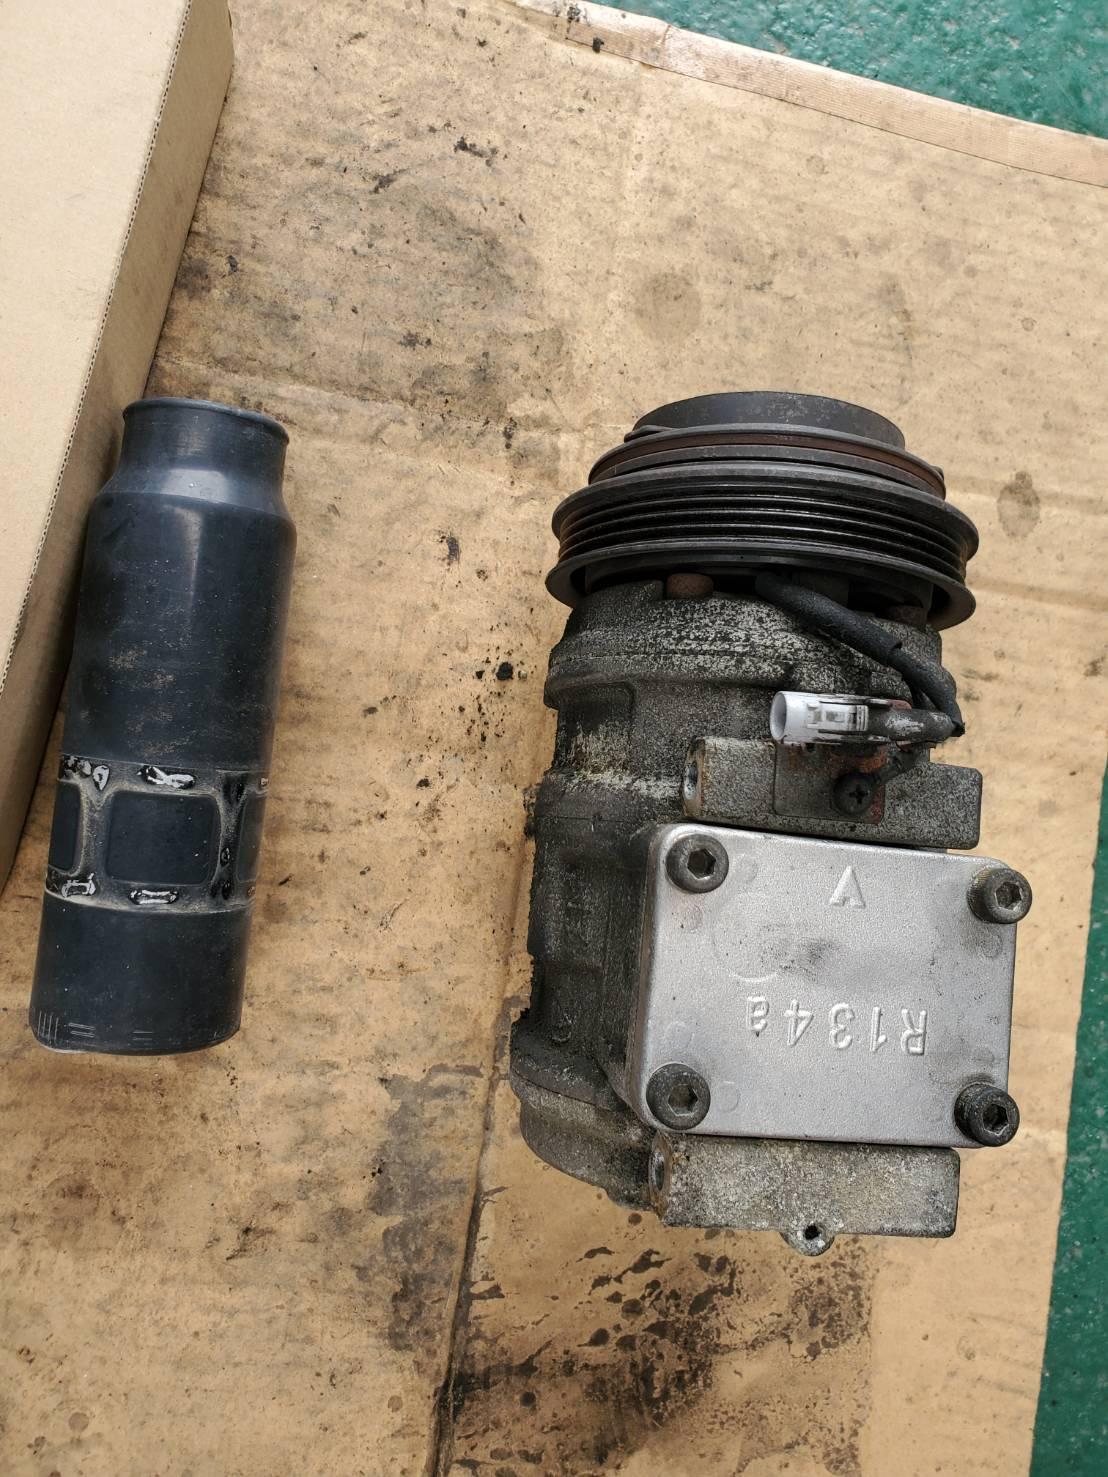 RZJ95 ランクルプラド エアコン修理 リビルト品 コンプレッサー引きずり